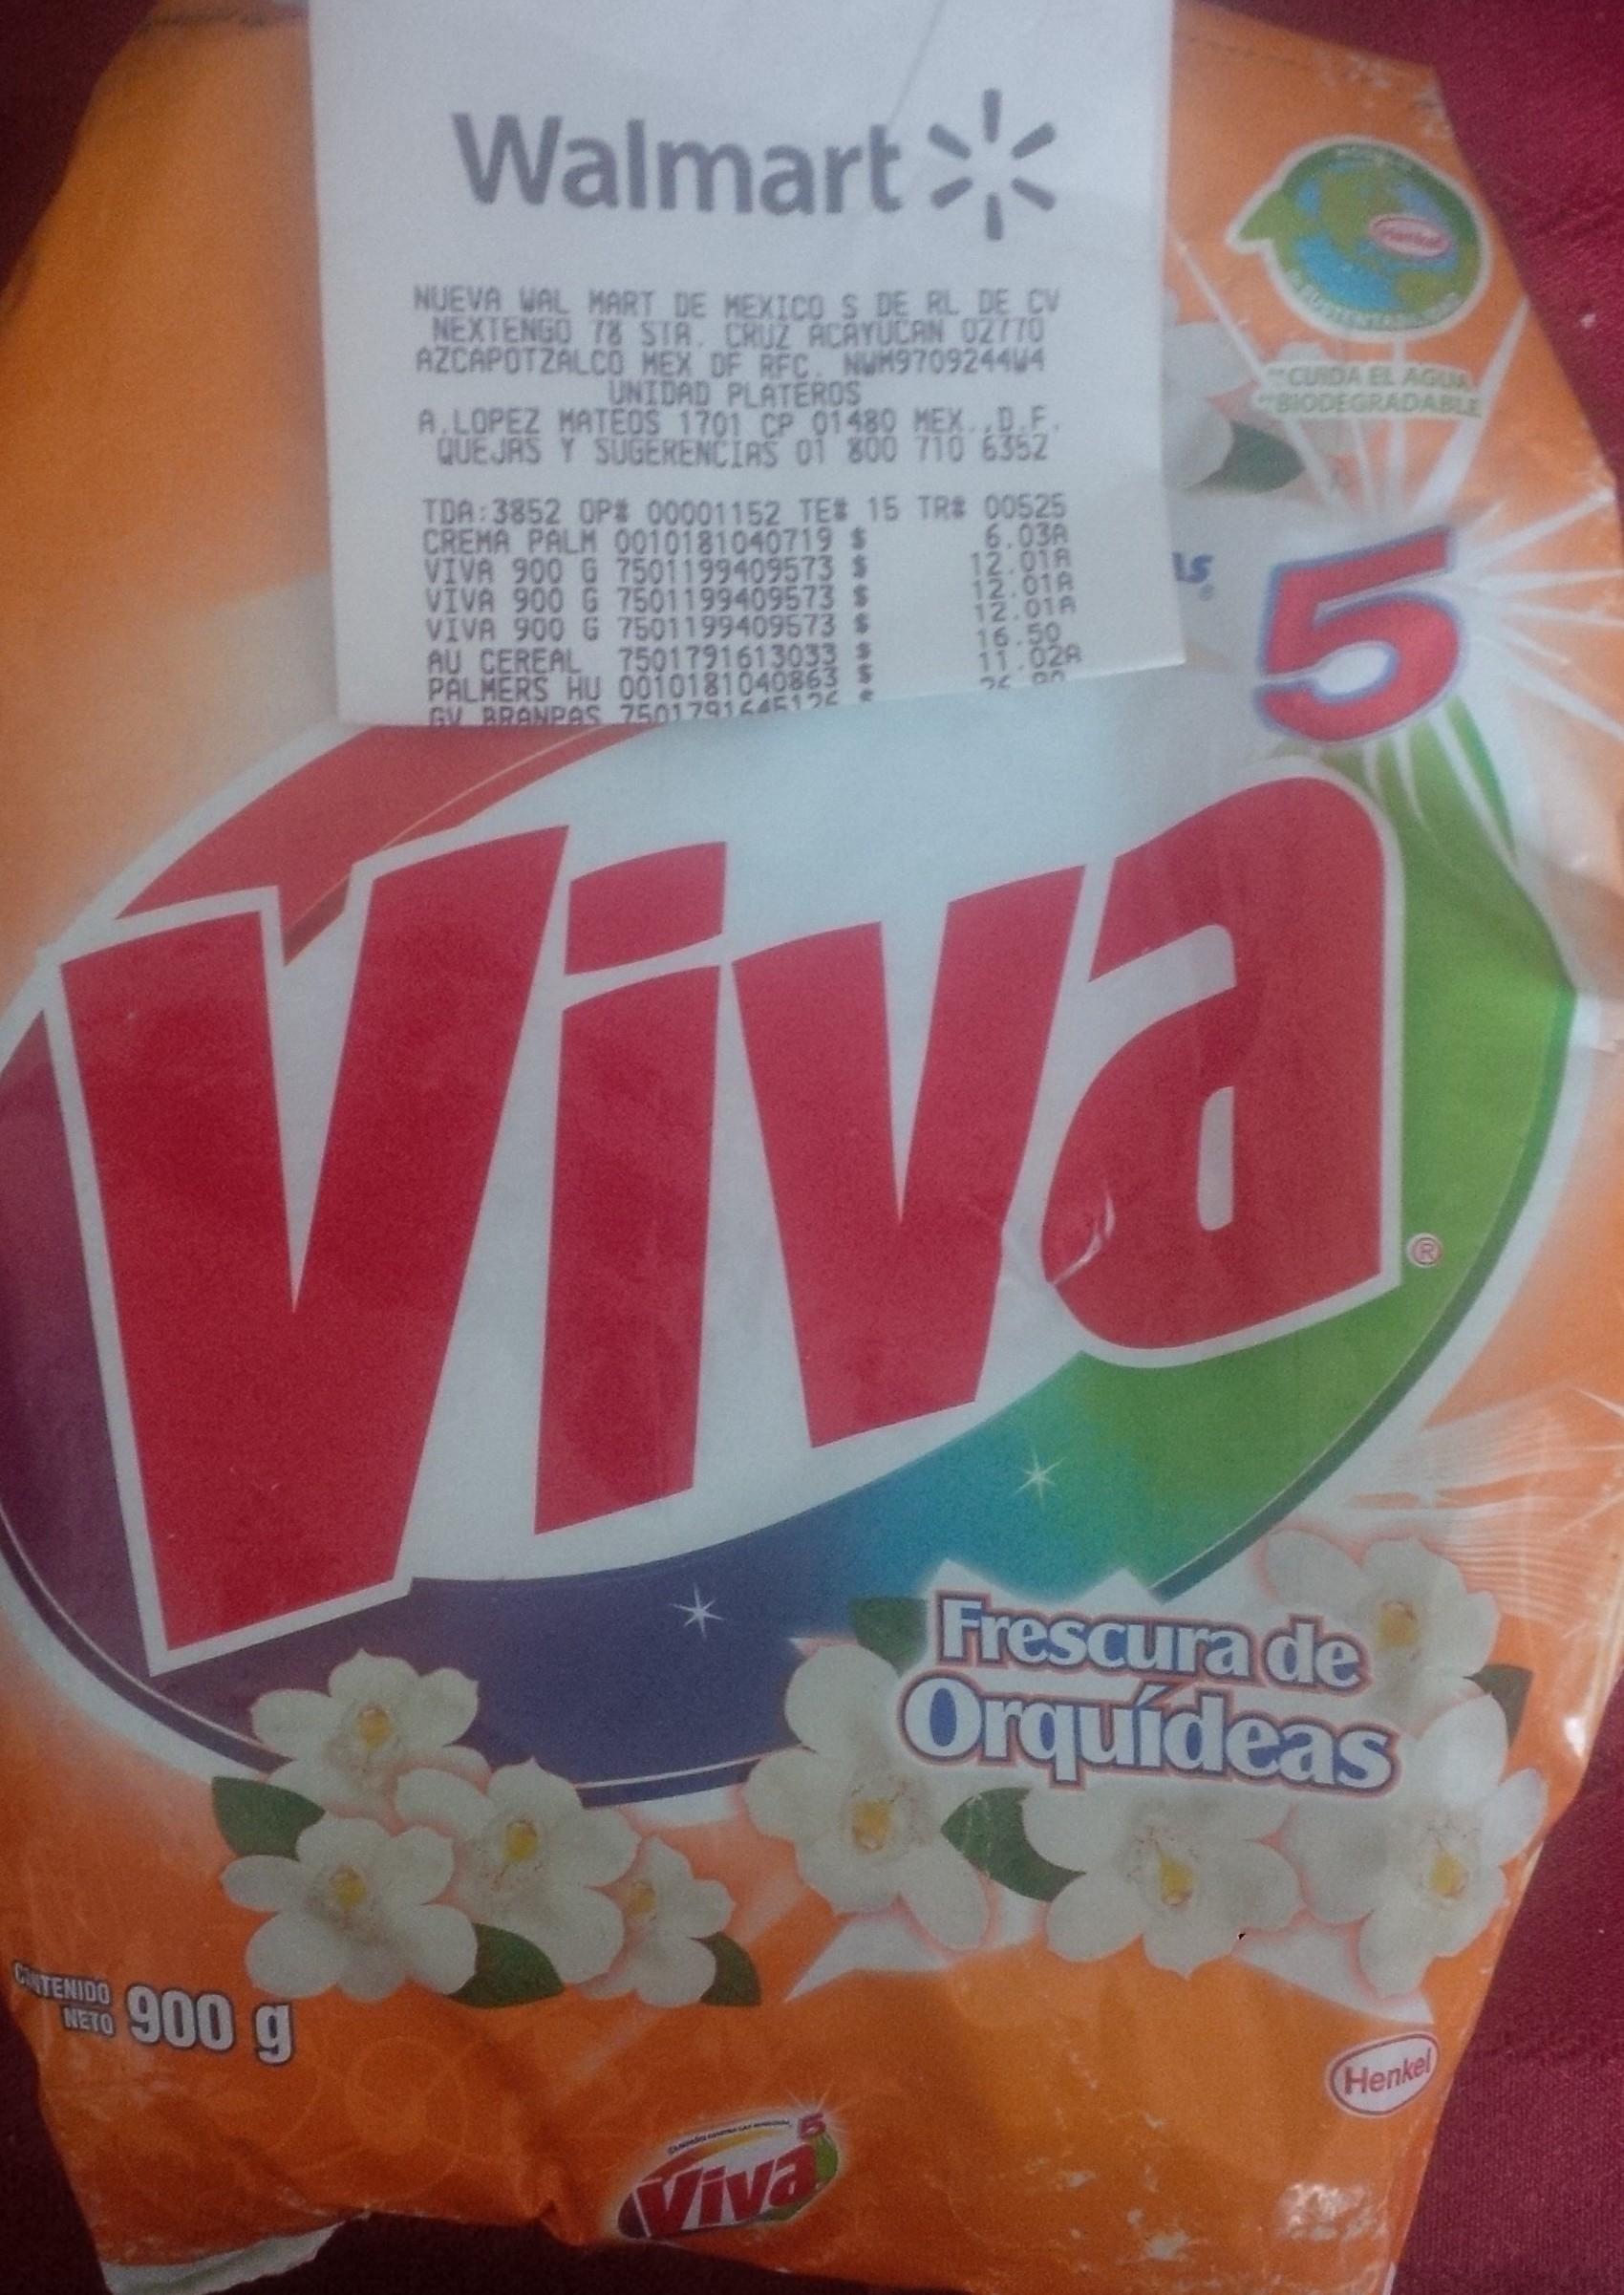 Walmart: detergente Viva5 Frescura de Orquídeas a $12.01